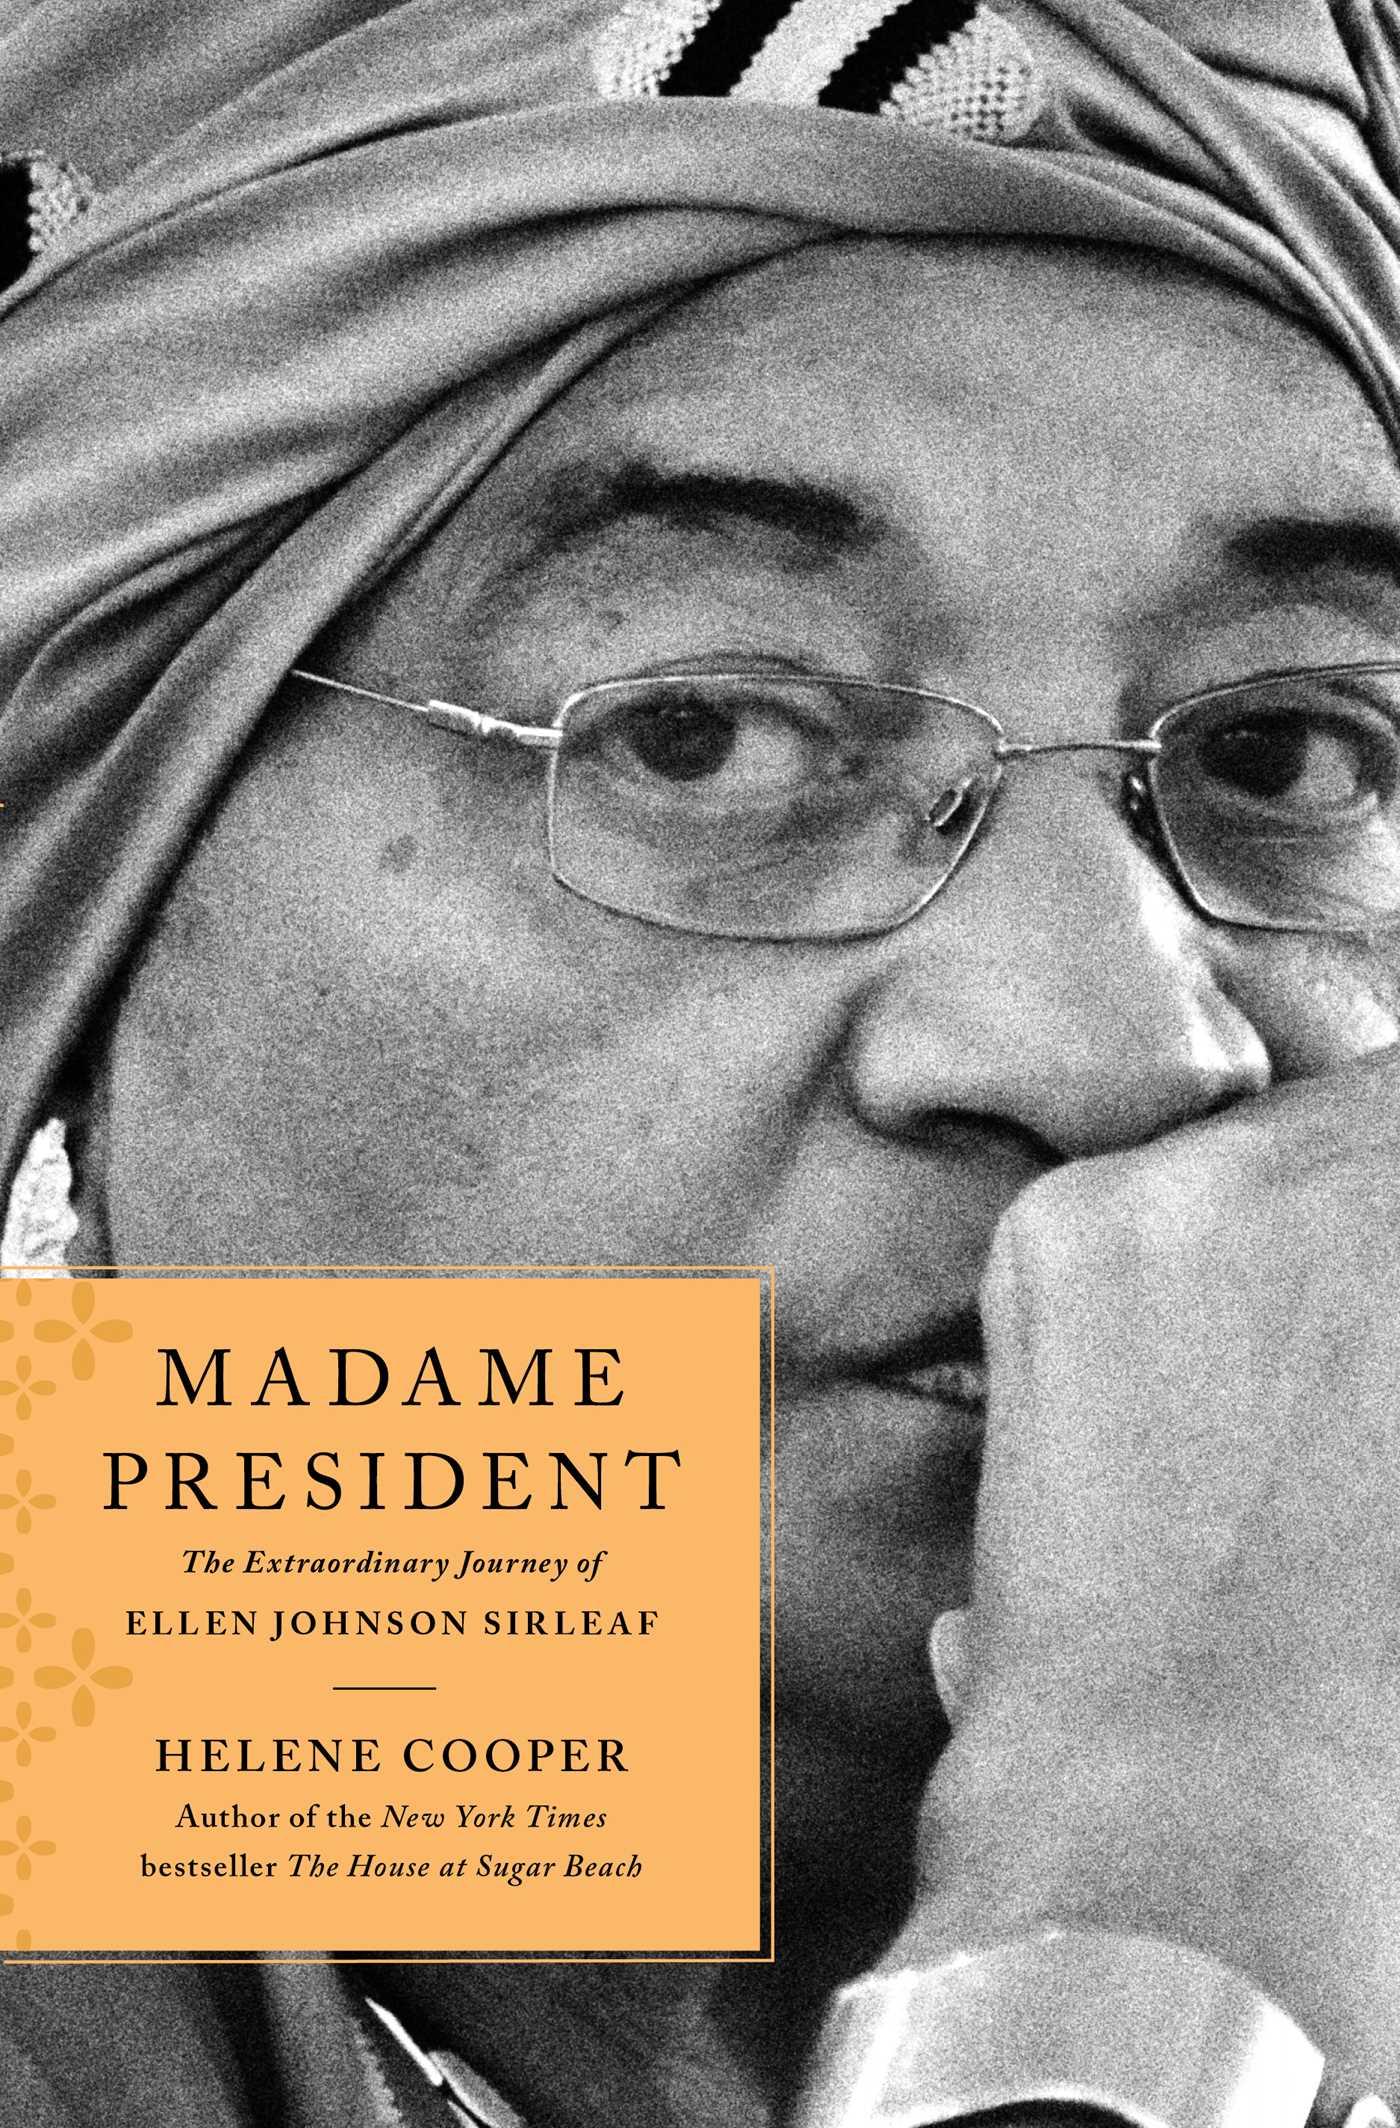 Madame president 9781451697353 hr